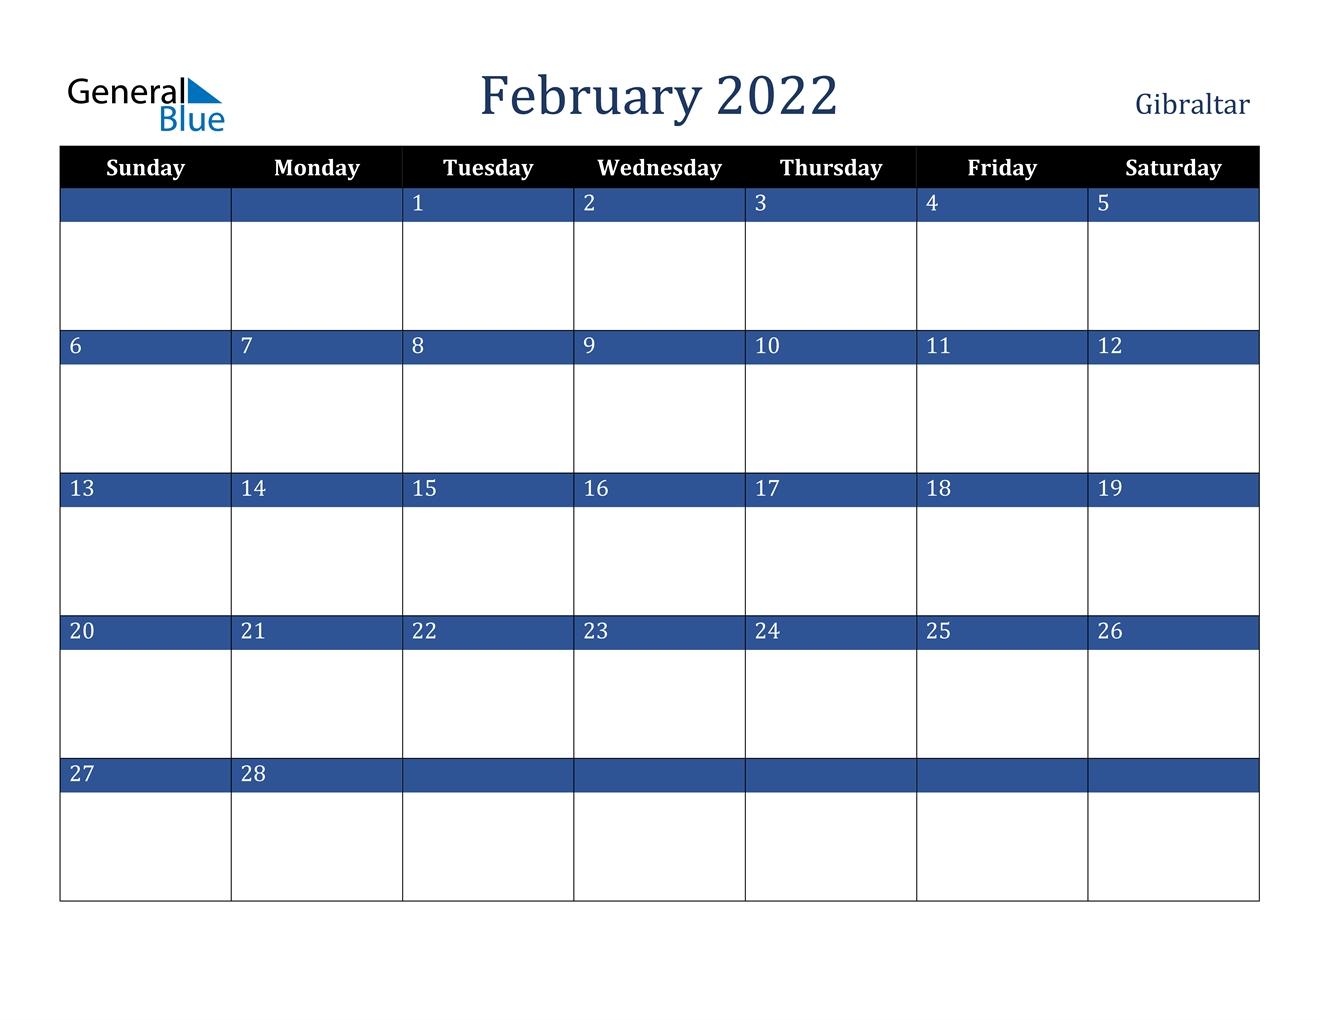 Gibraltar February 2022 Calendar With Holidays